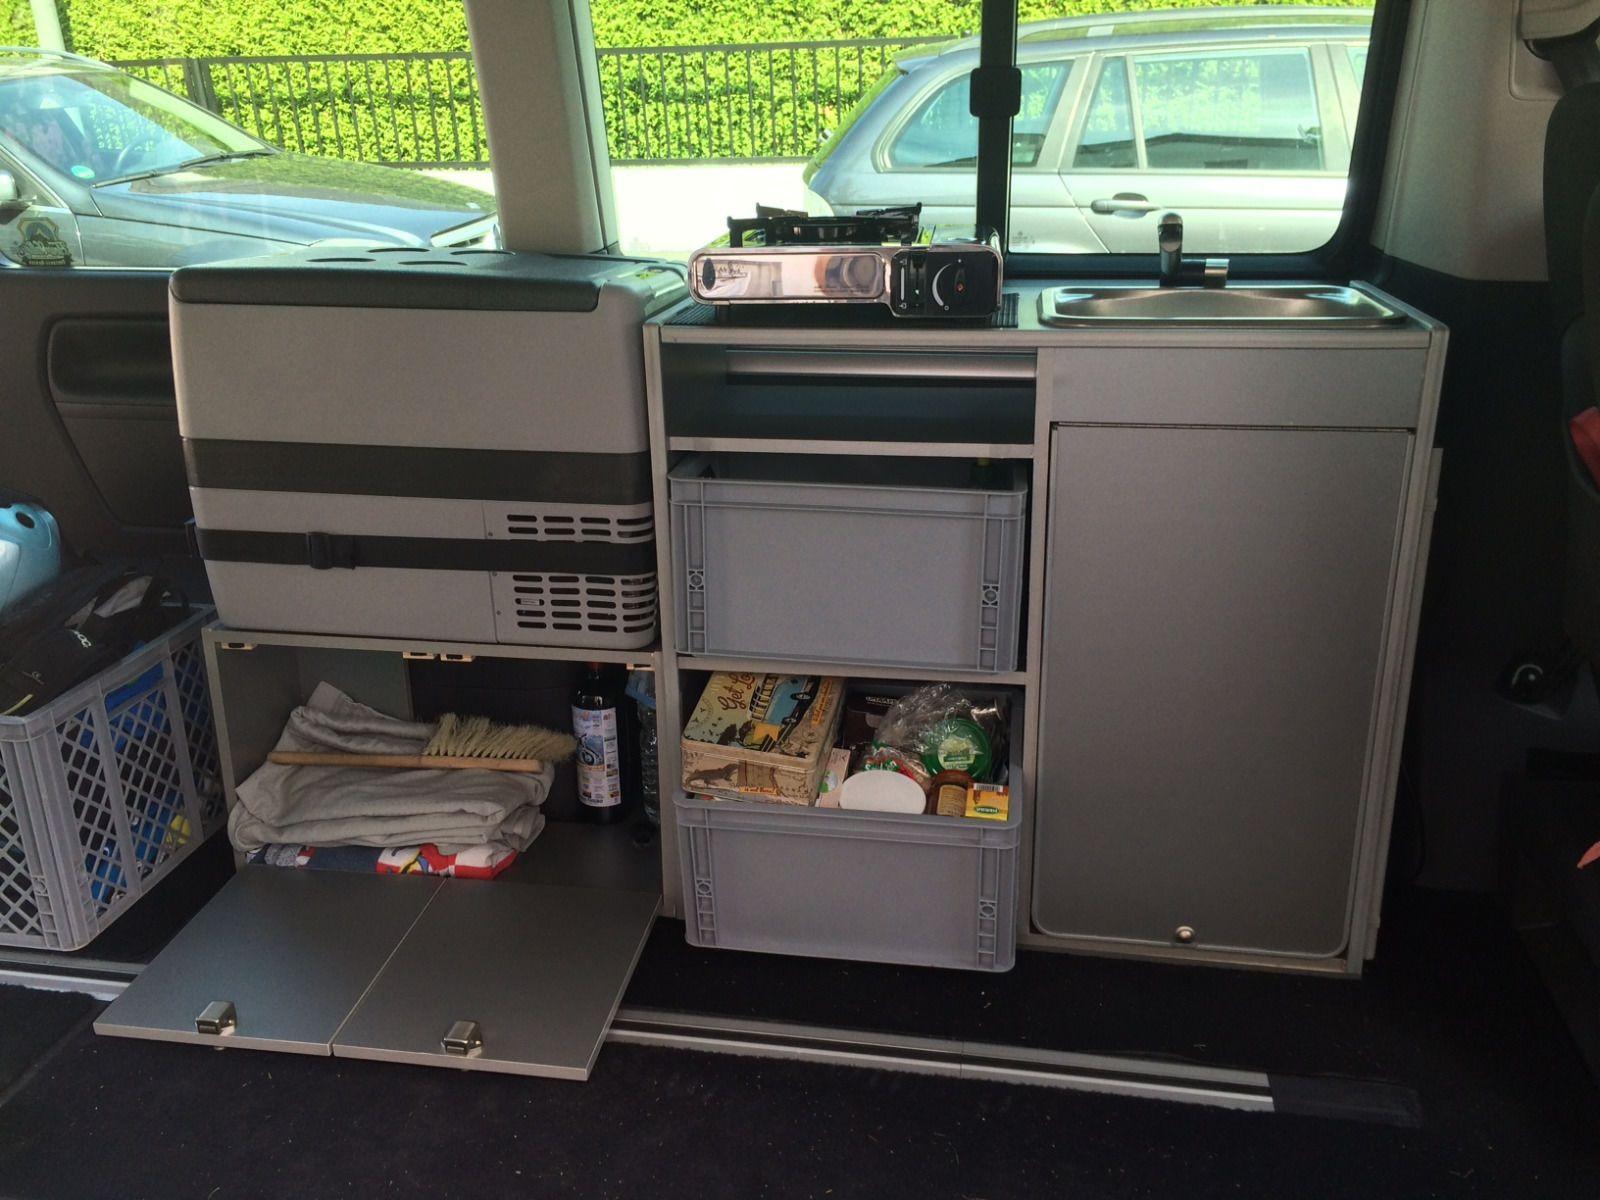 Camping küchenblock selber bauen  VW T5 California Beach Ausbau Küche Schrank Spüle Eigenbau nach ...